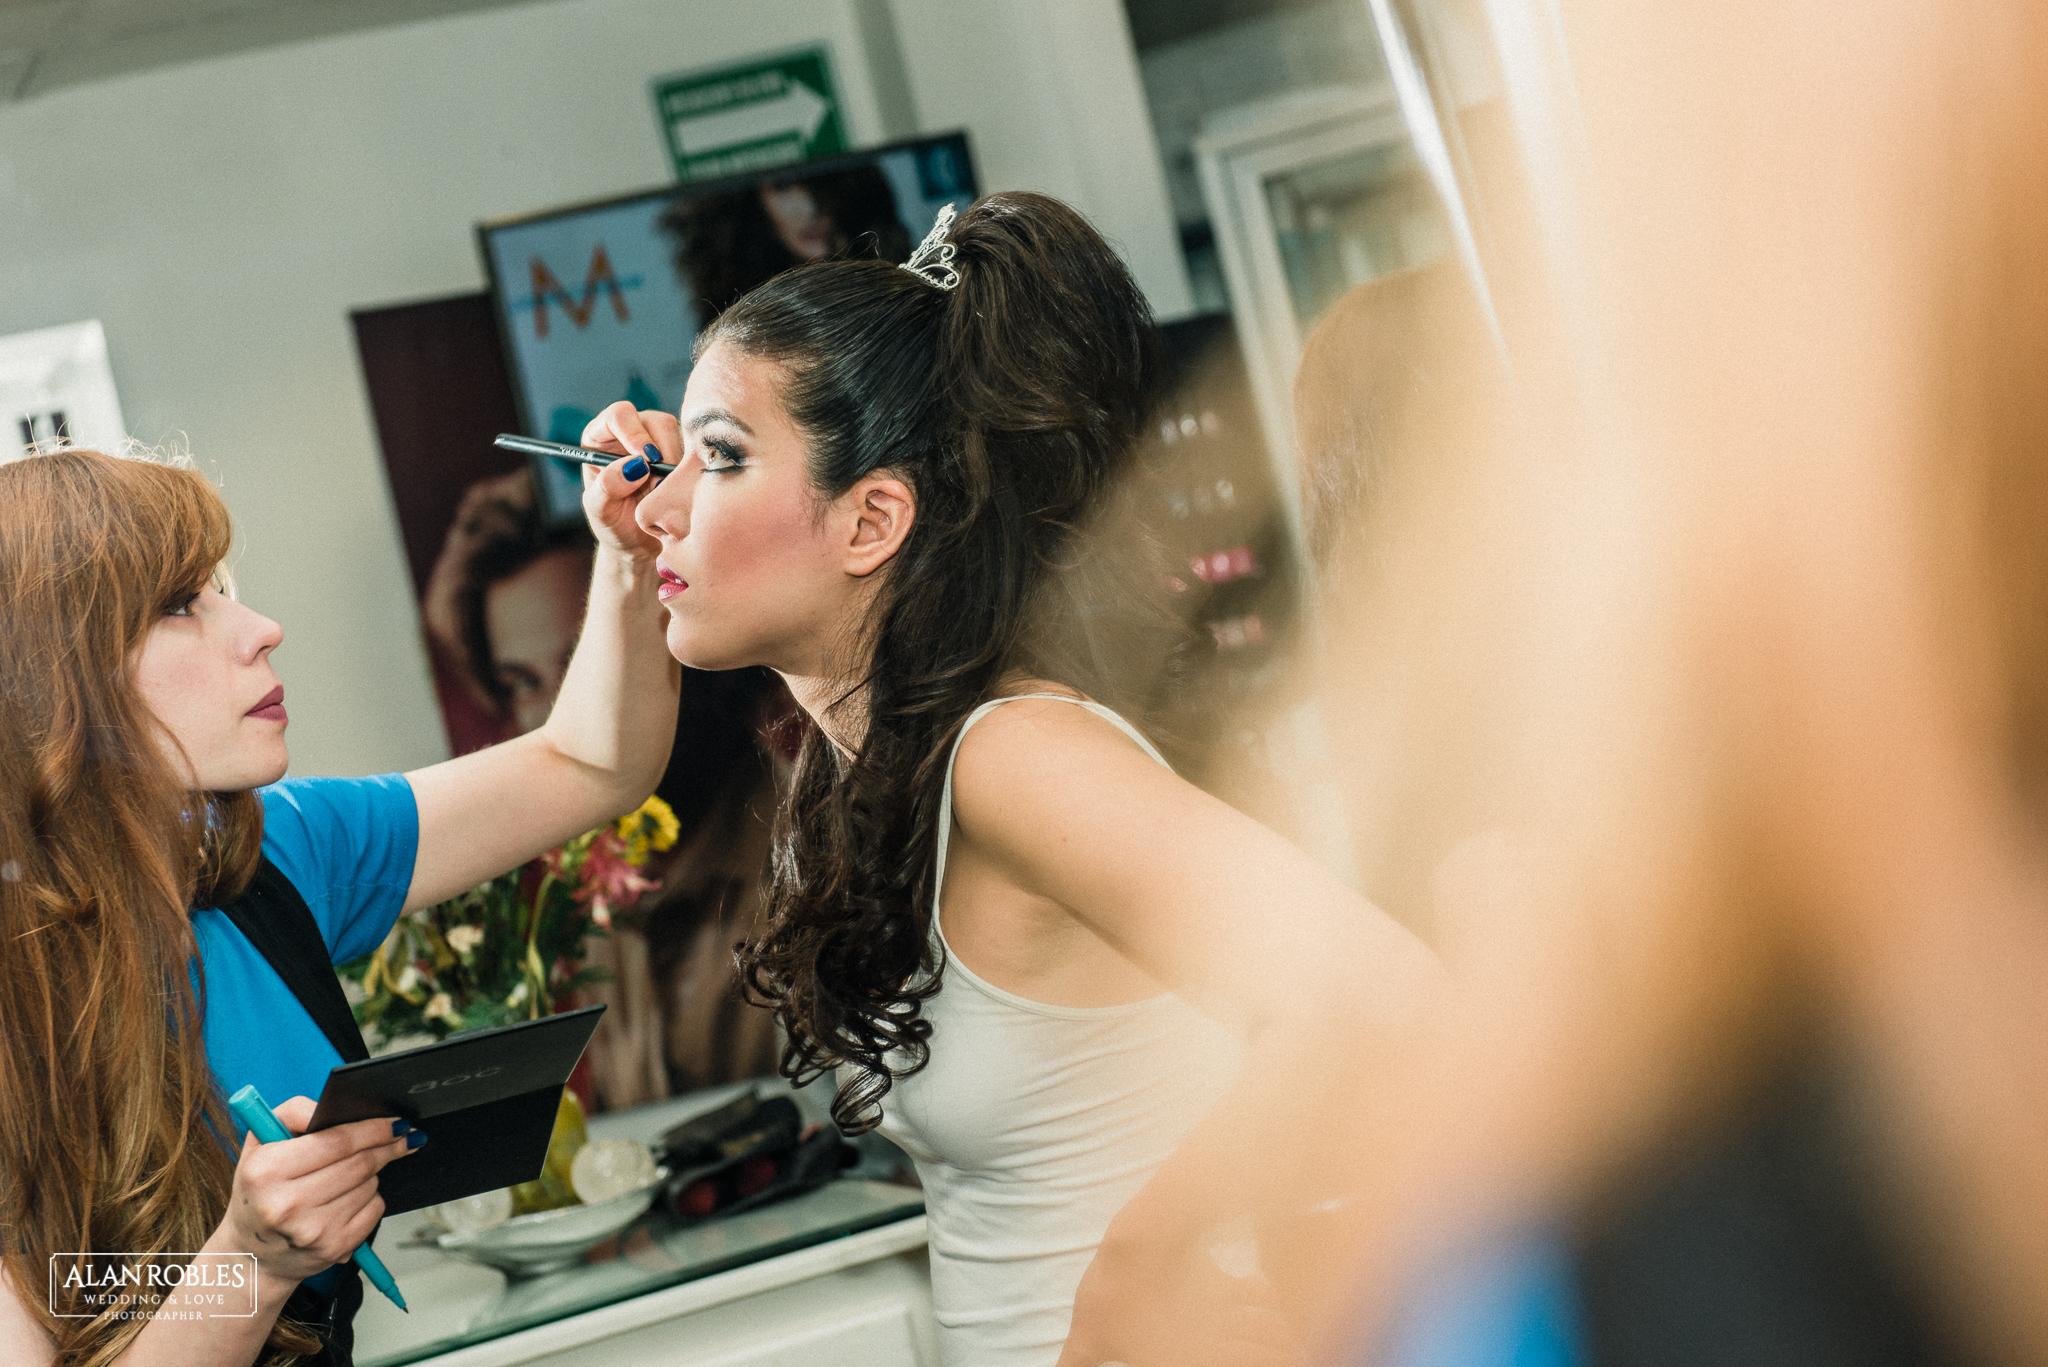 Maquillando a la novia. Getting Ready en Salon Patrice en Guadalajara Bugambilias. Fotografo de Bodas Alan Robles Wedding & Love Photographer.